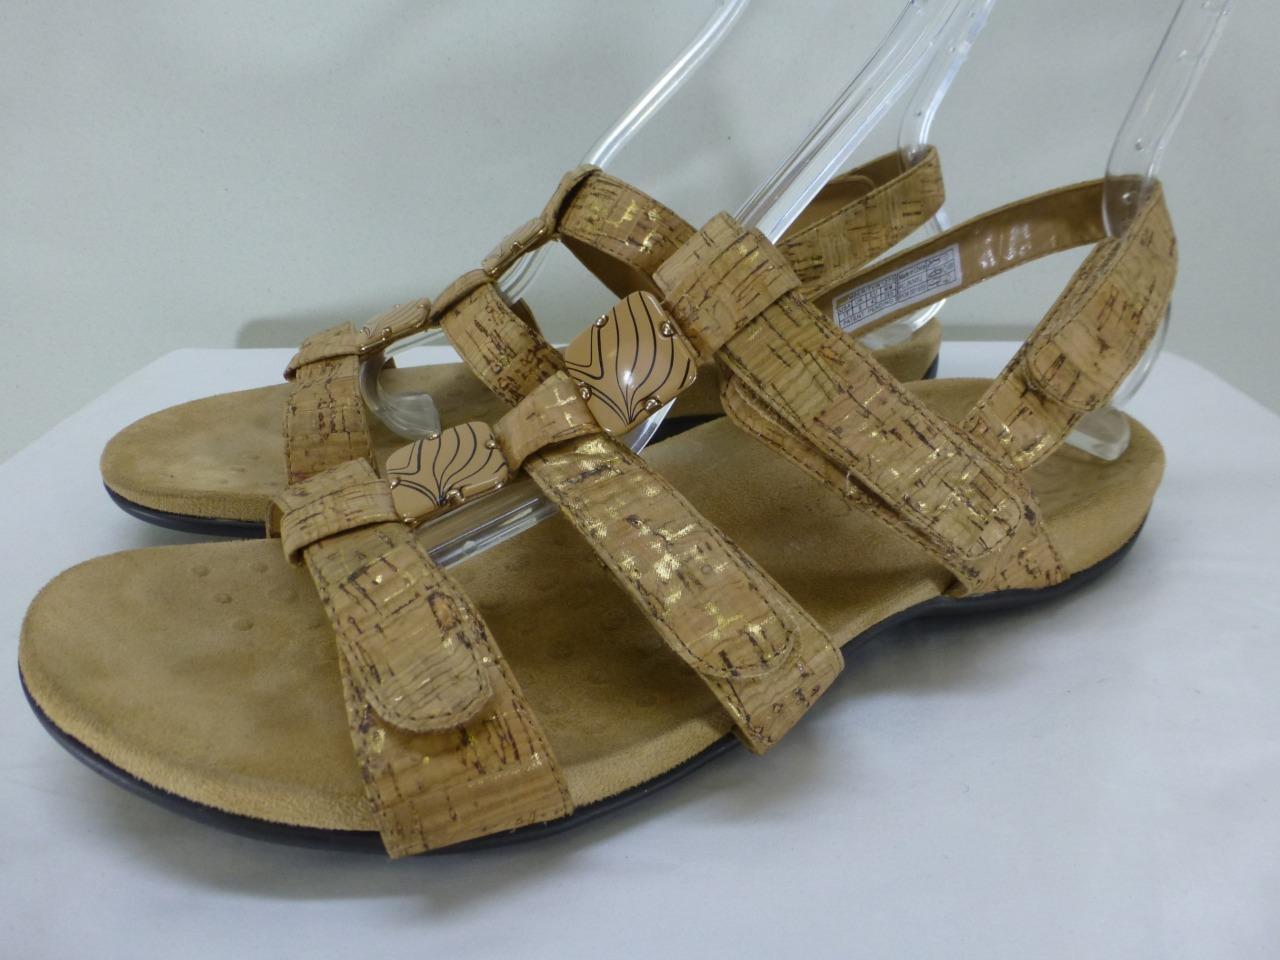 Vionic Orthaheel 44Amber slingback tan cork look Sandals shoes womens sz 11 42